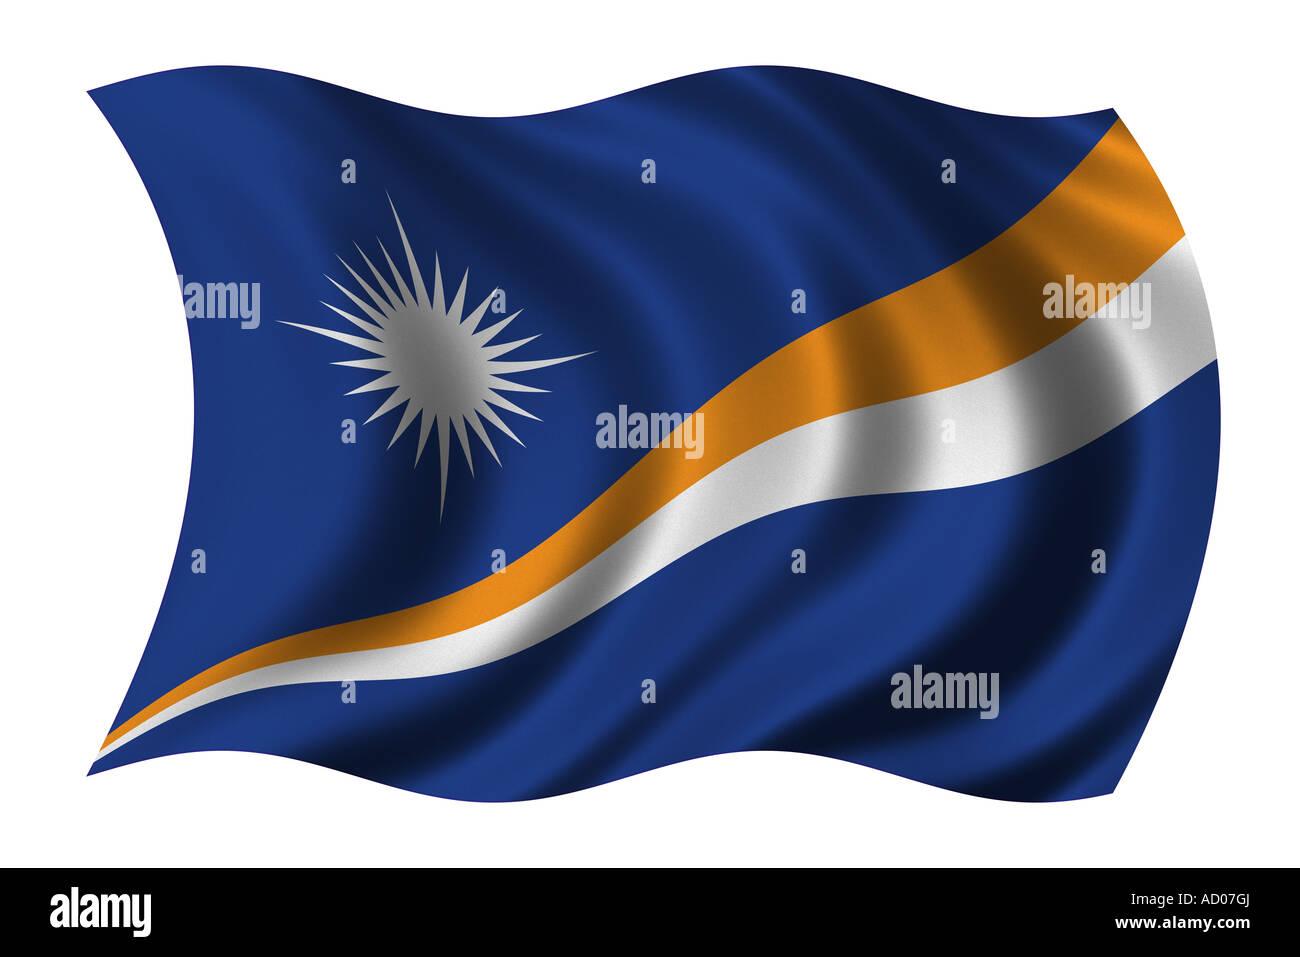 Flag of the Marshall Islands - Stock Image